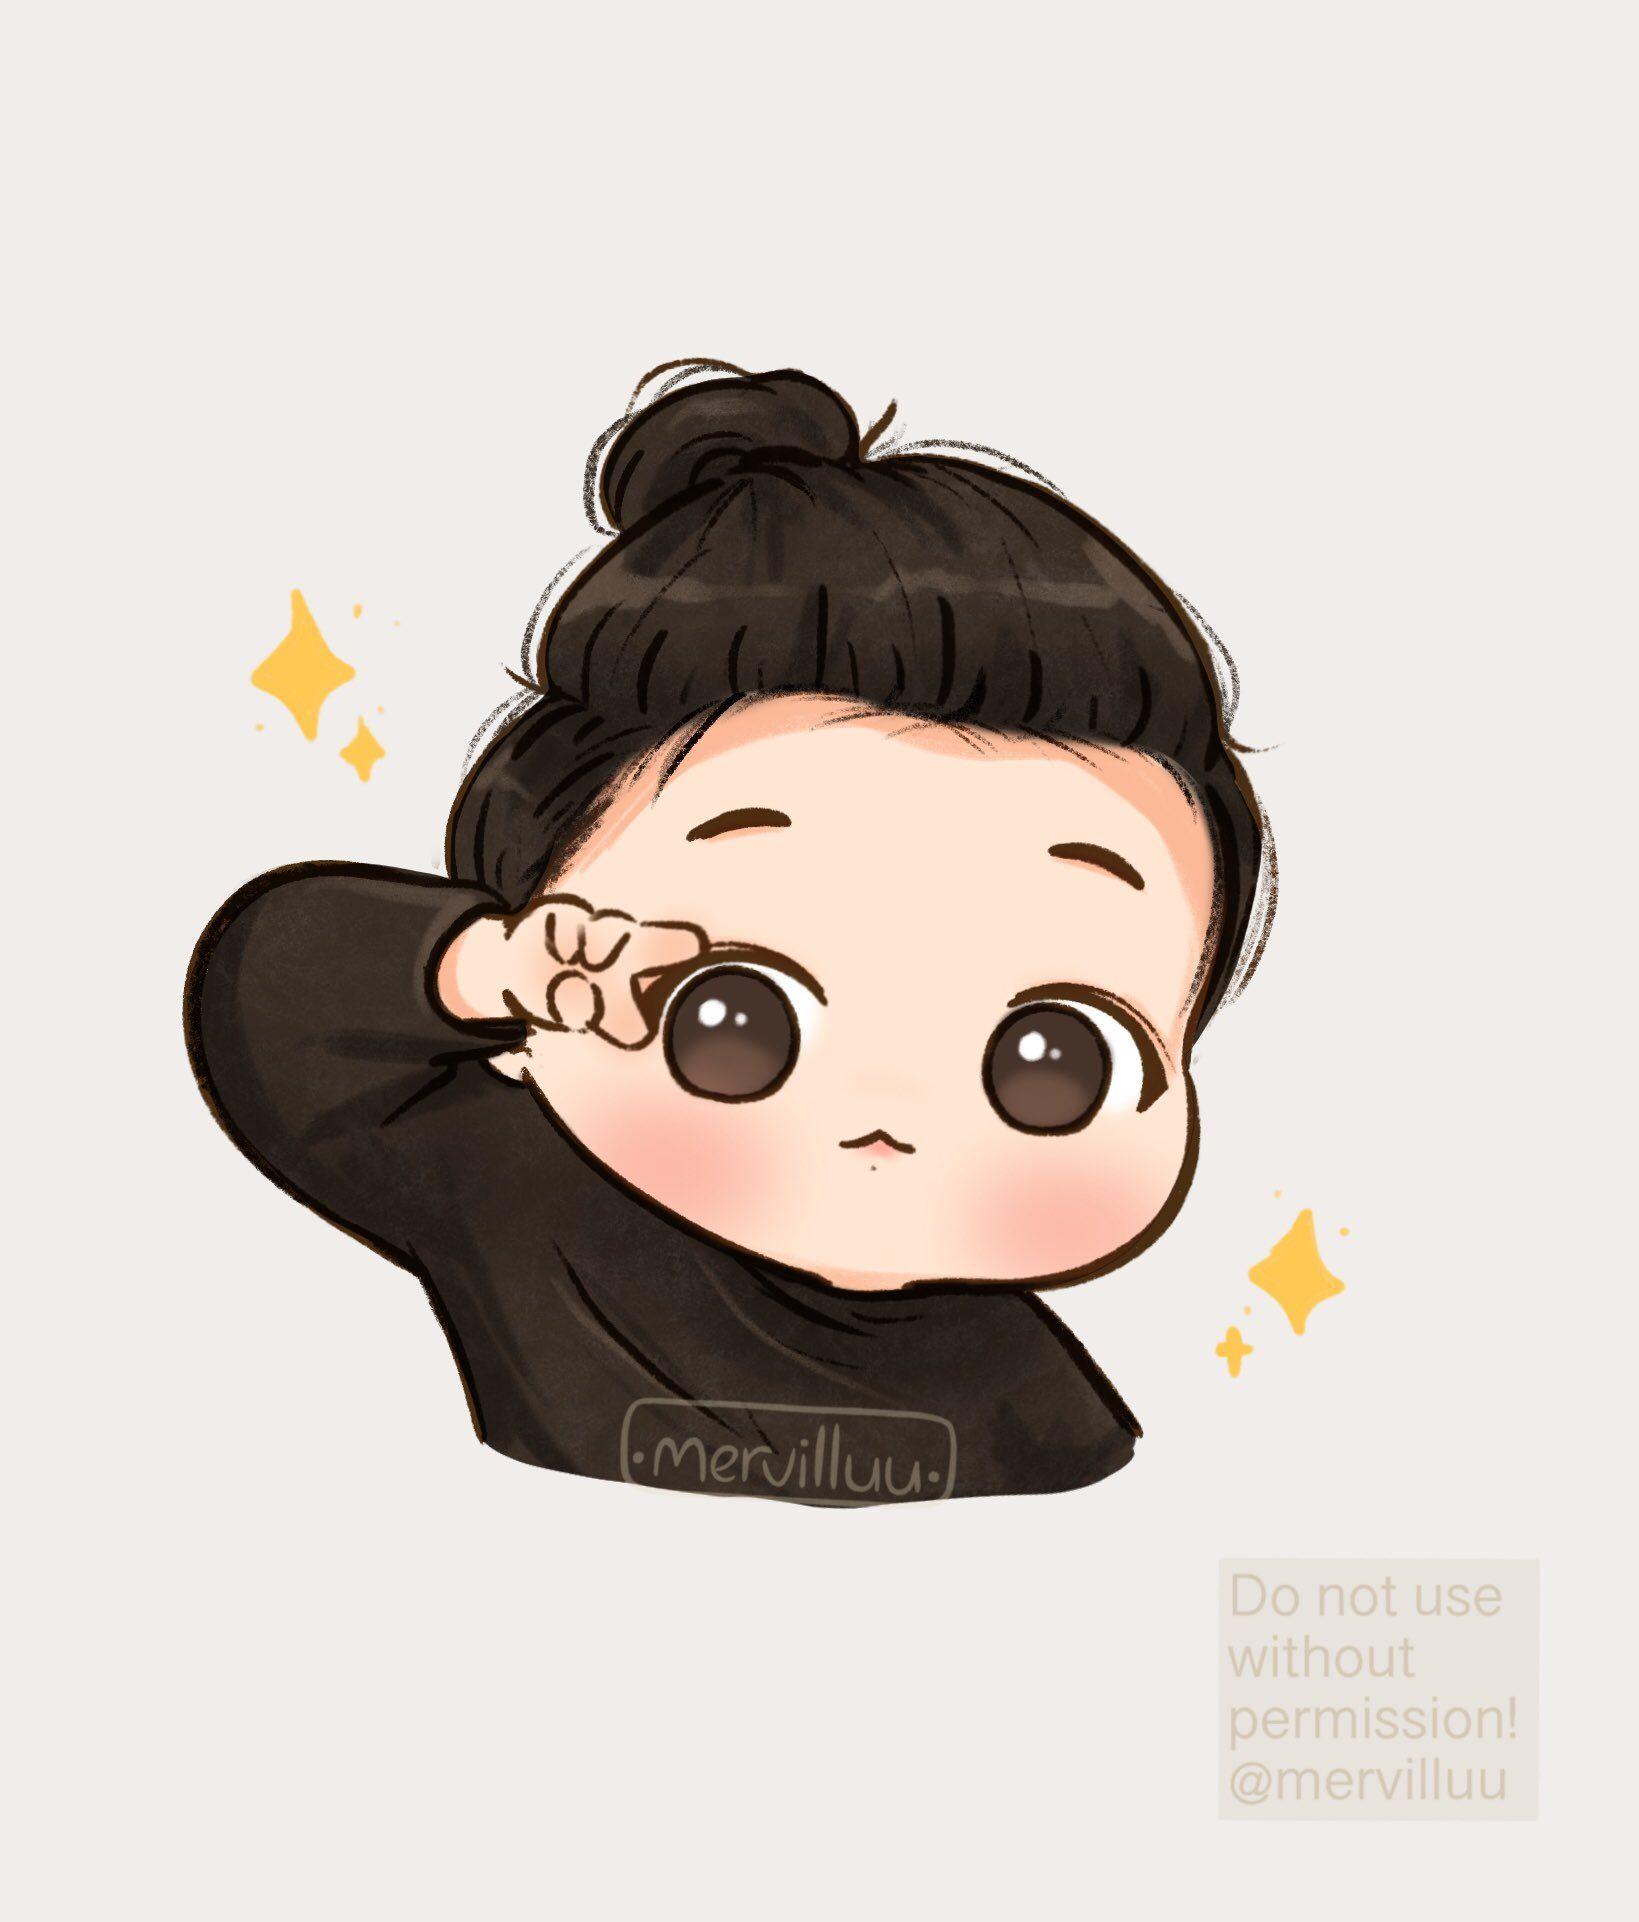 Merve On Twitter Chibi Bts Chibi Character Design Animation Bts jungkook chibi wallpaper